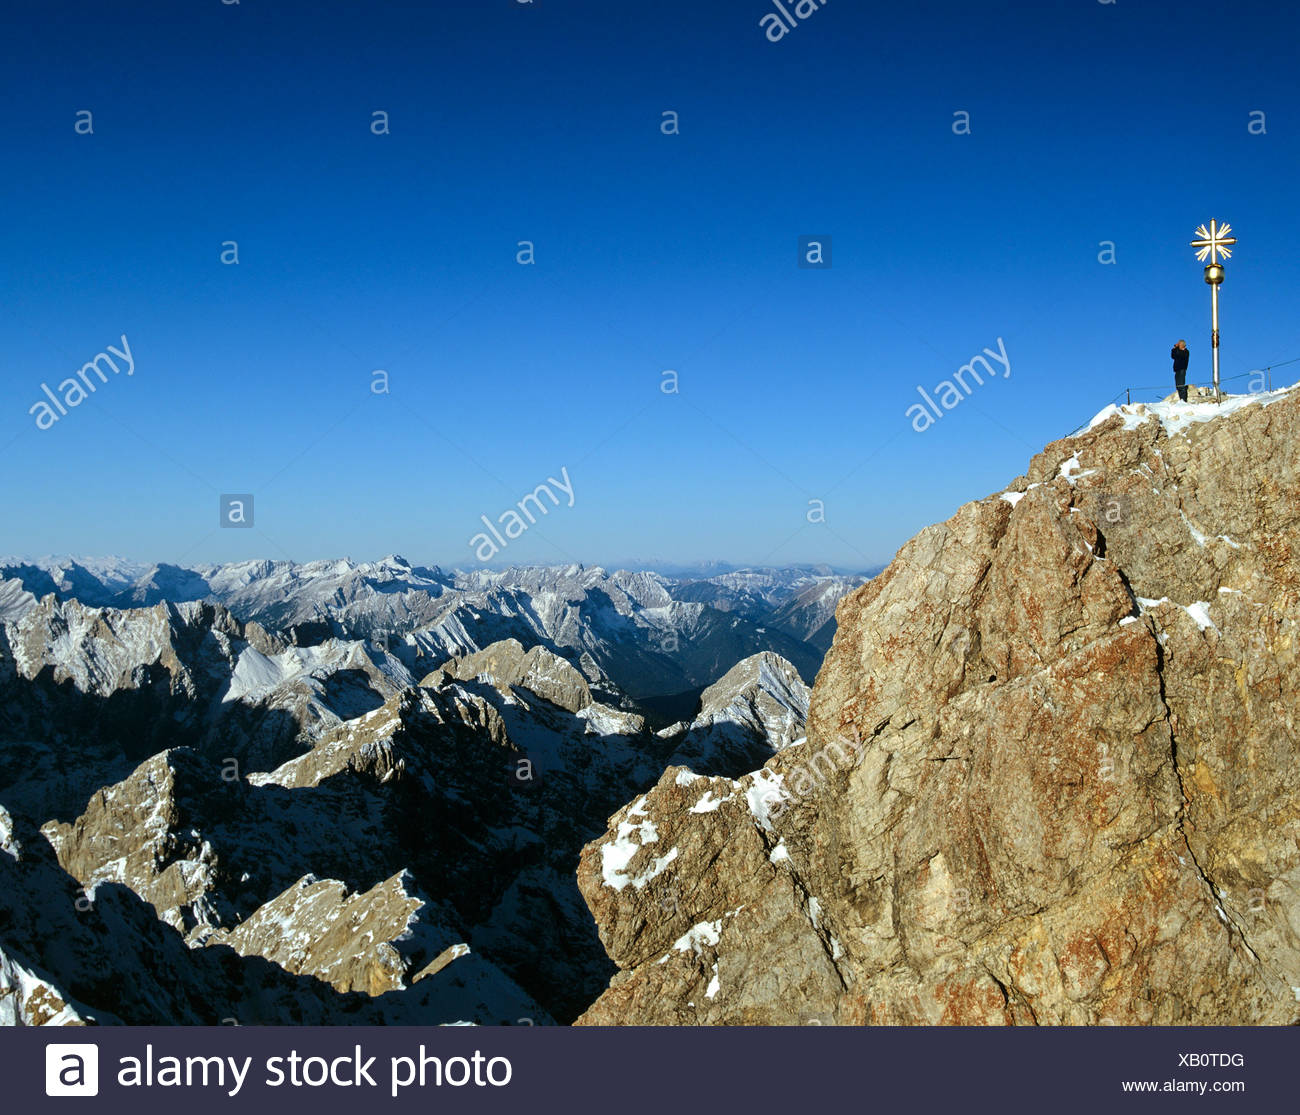 Summit cross at 2962 m or 9718 ft on the Zugspitze, Germany's highest mountain, Wetterstein Range, Werdenfels Region, Upper Bav - Stock Image